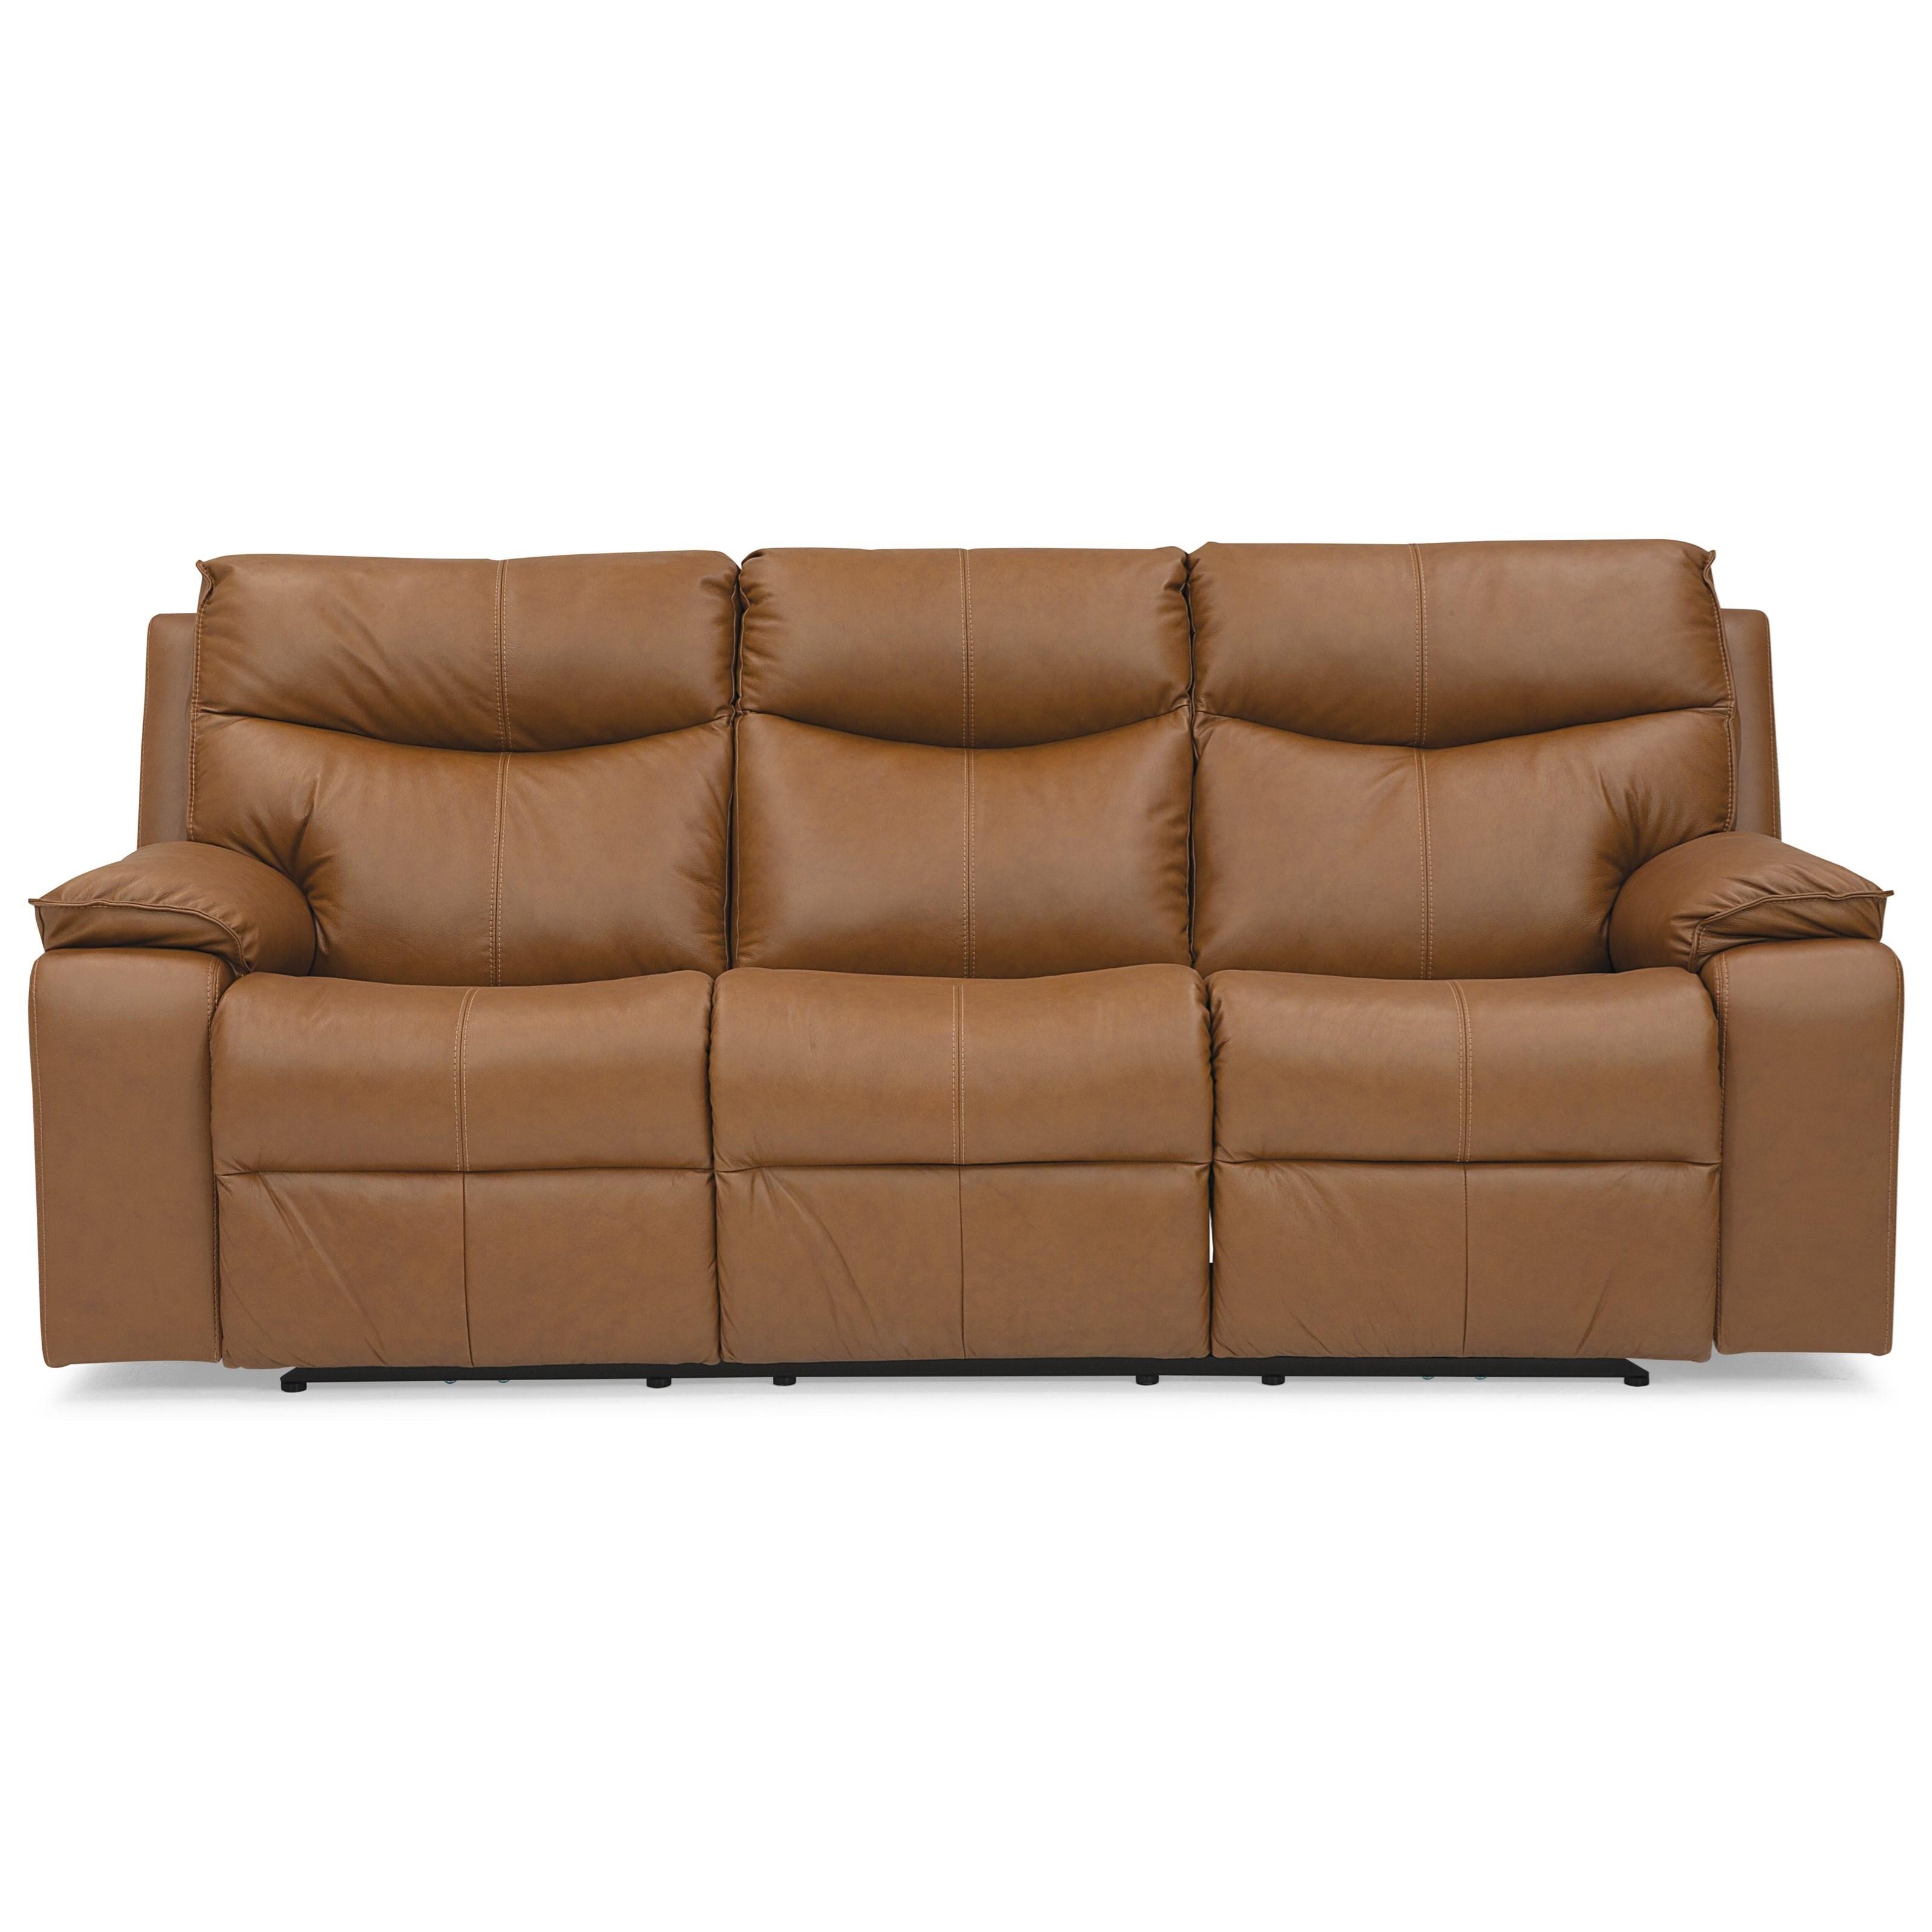 Providence Sofa w/ Power Recline by Palliser at Jordan's Home Furnishings